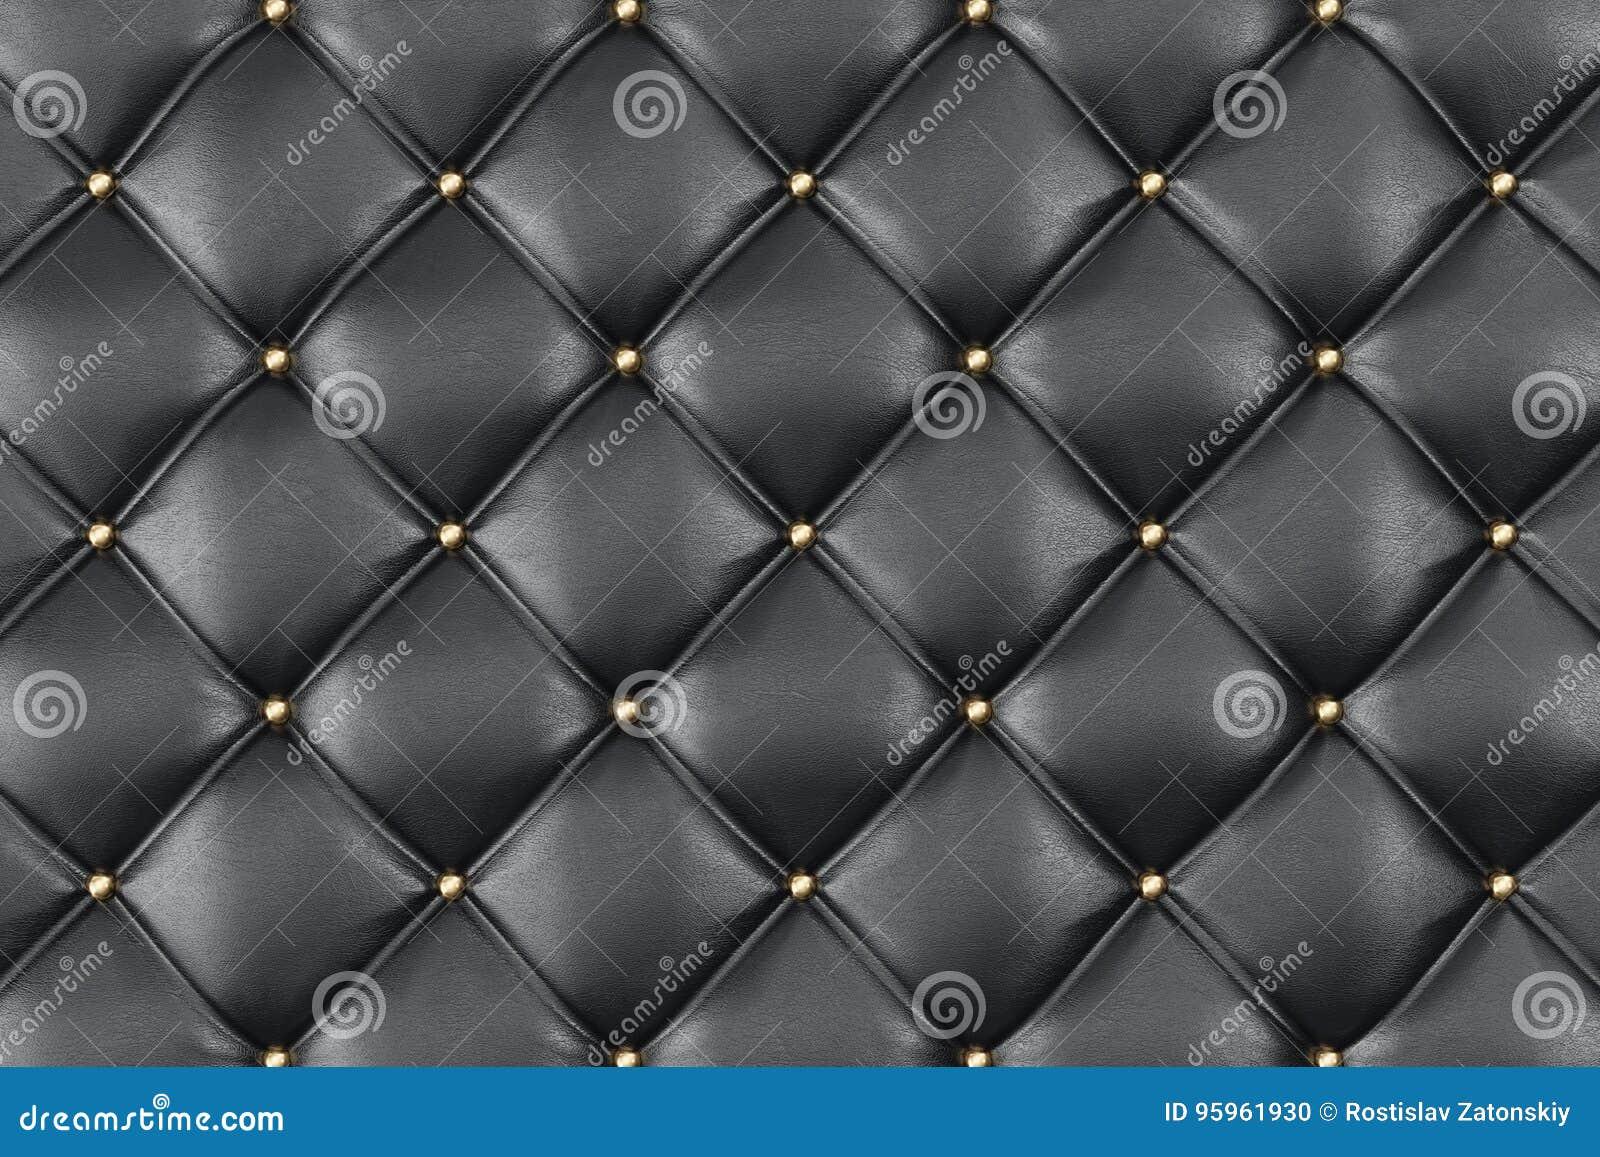 Leather upholstery sofa background black luxury - Tapiceros de sofas en logrono ...